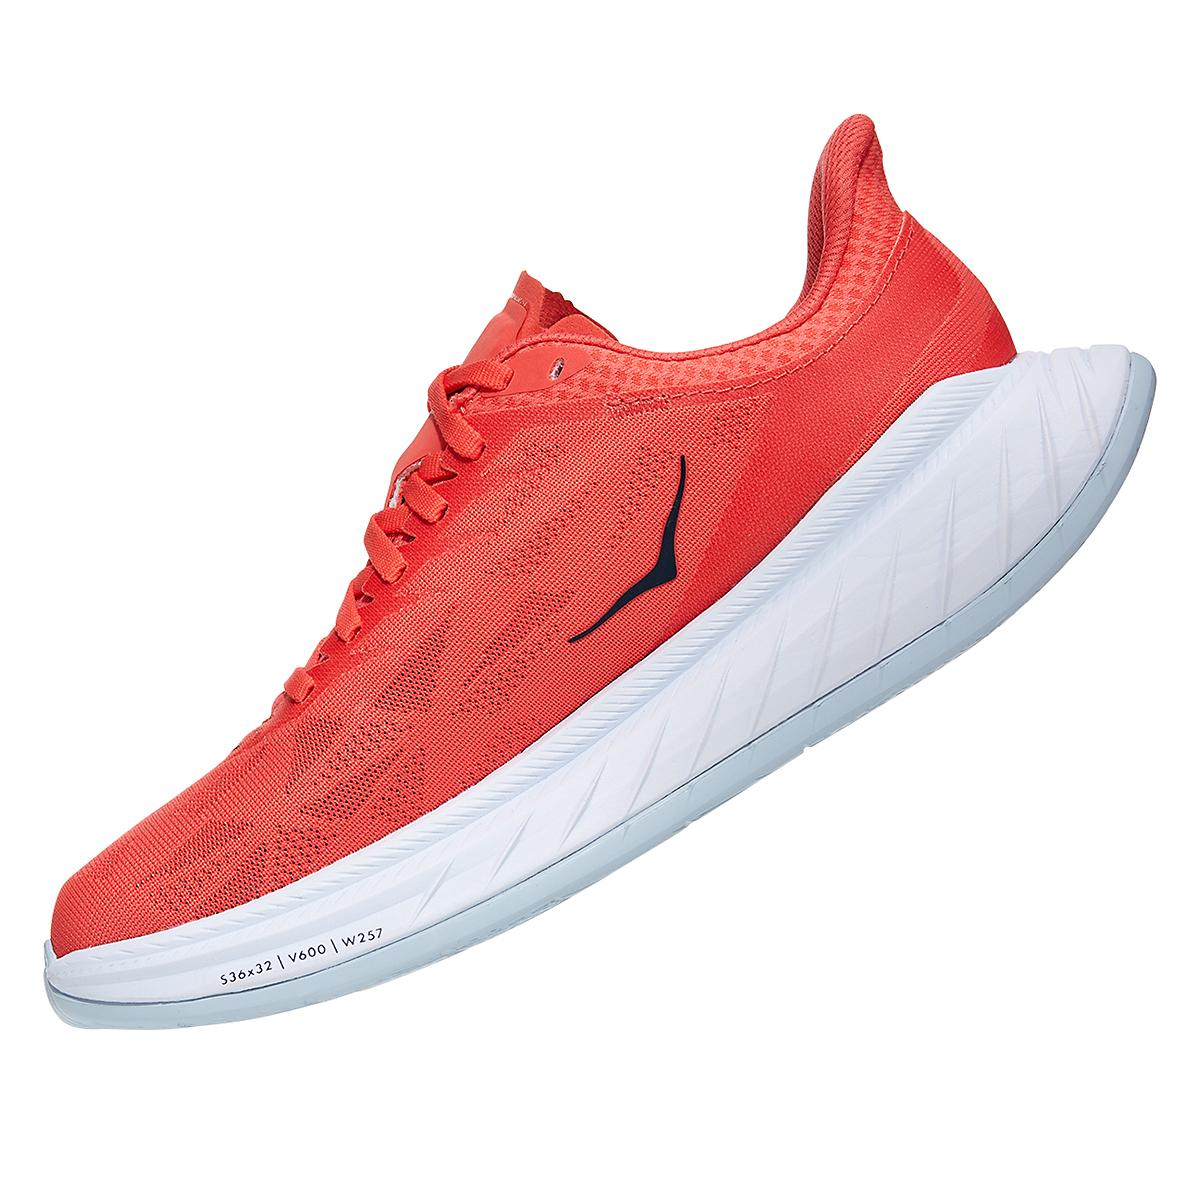 Women's Hoka One One Carbon X 2 Running Shoe - Color: Hot Coral/Black Iris - Size: 5 - Width: Regular, Hot Coral/Black Iris, large, image 4